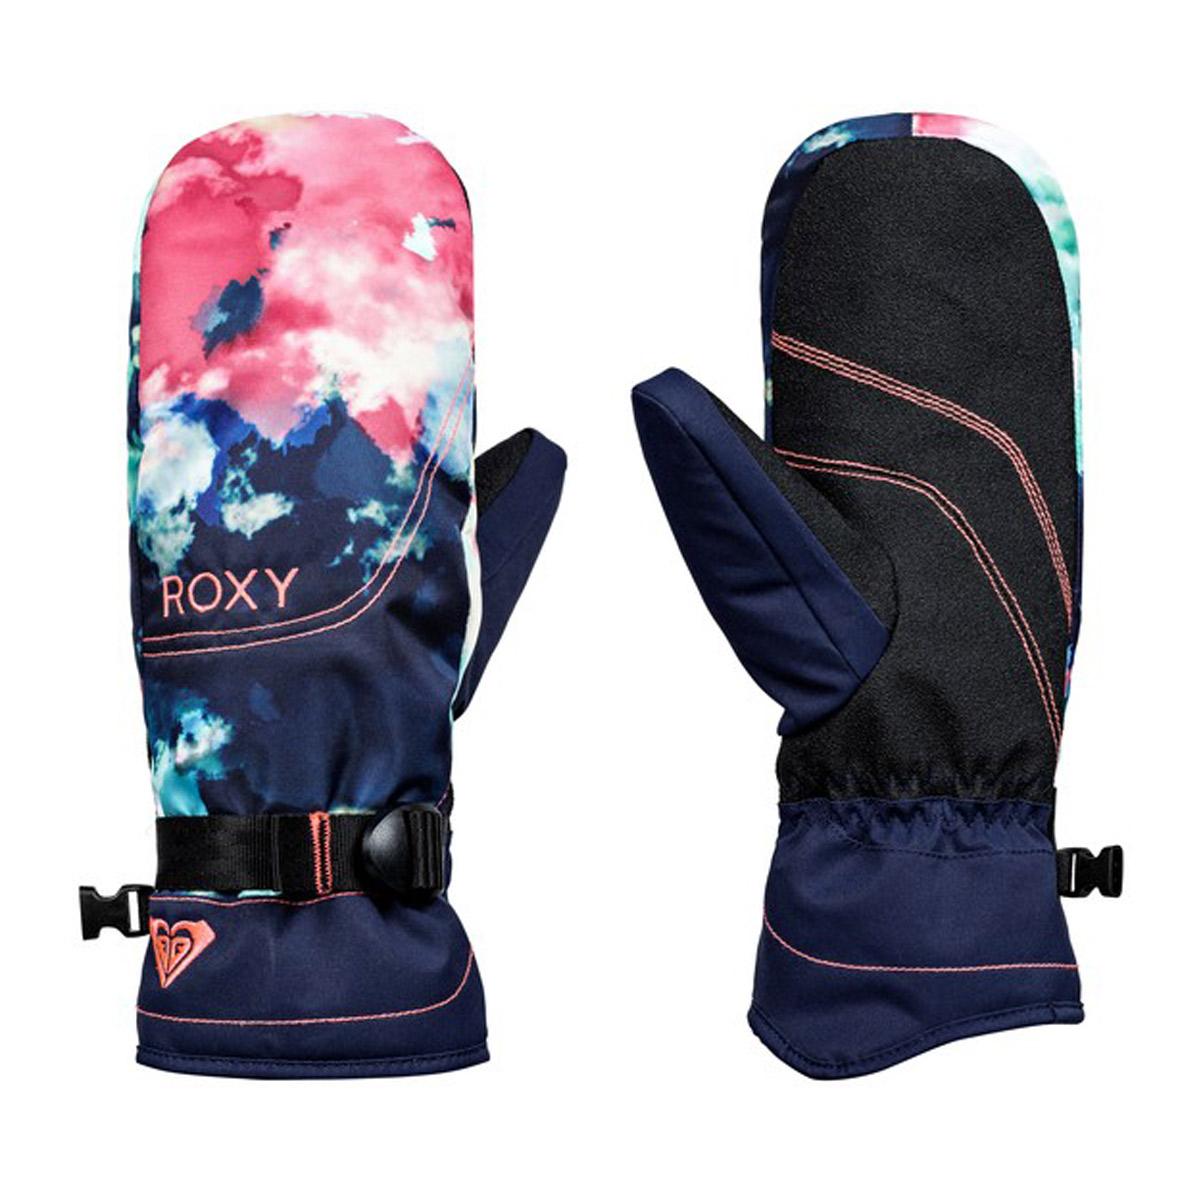 Перчатки и варежки ROXY Jetty Se Mitt Neon Grapefruit 2017/2018